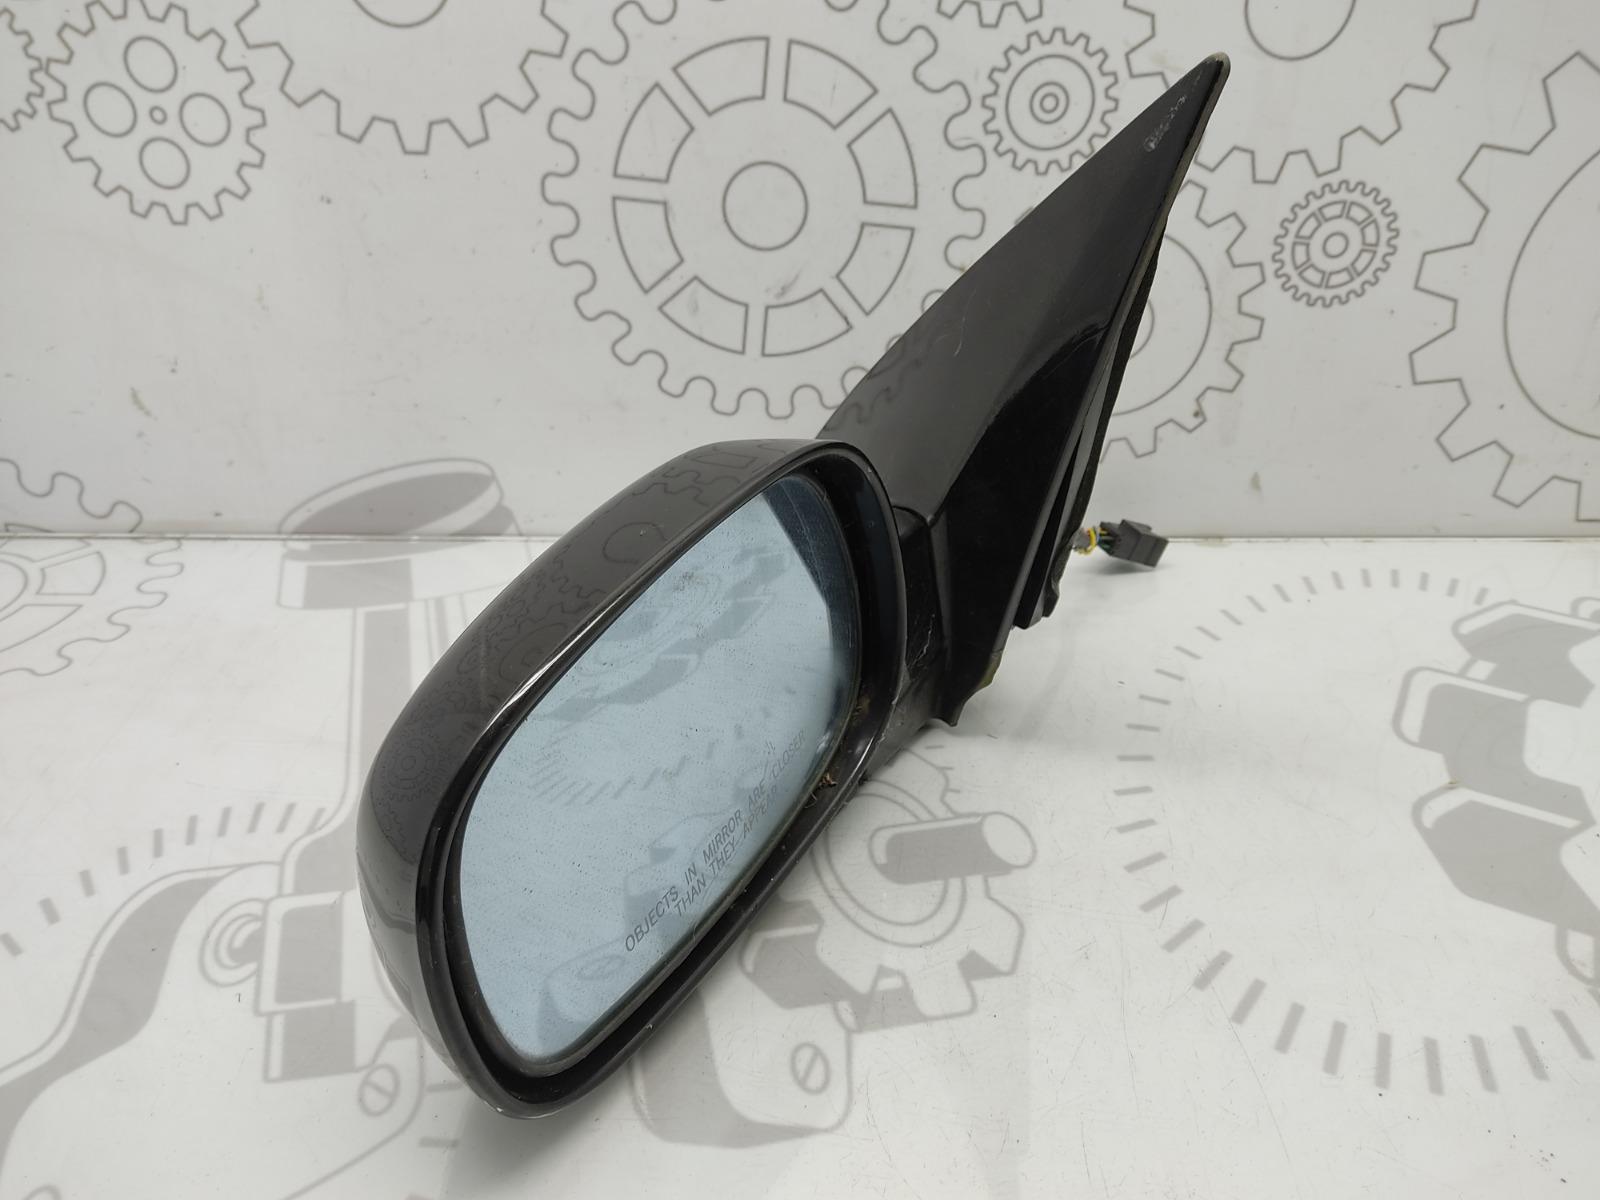 Зеркало наружное левое Ssangyong Rexton 2.7 CRDI 2005 (б/у)